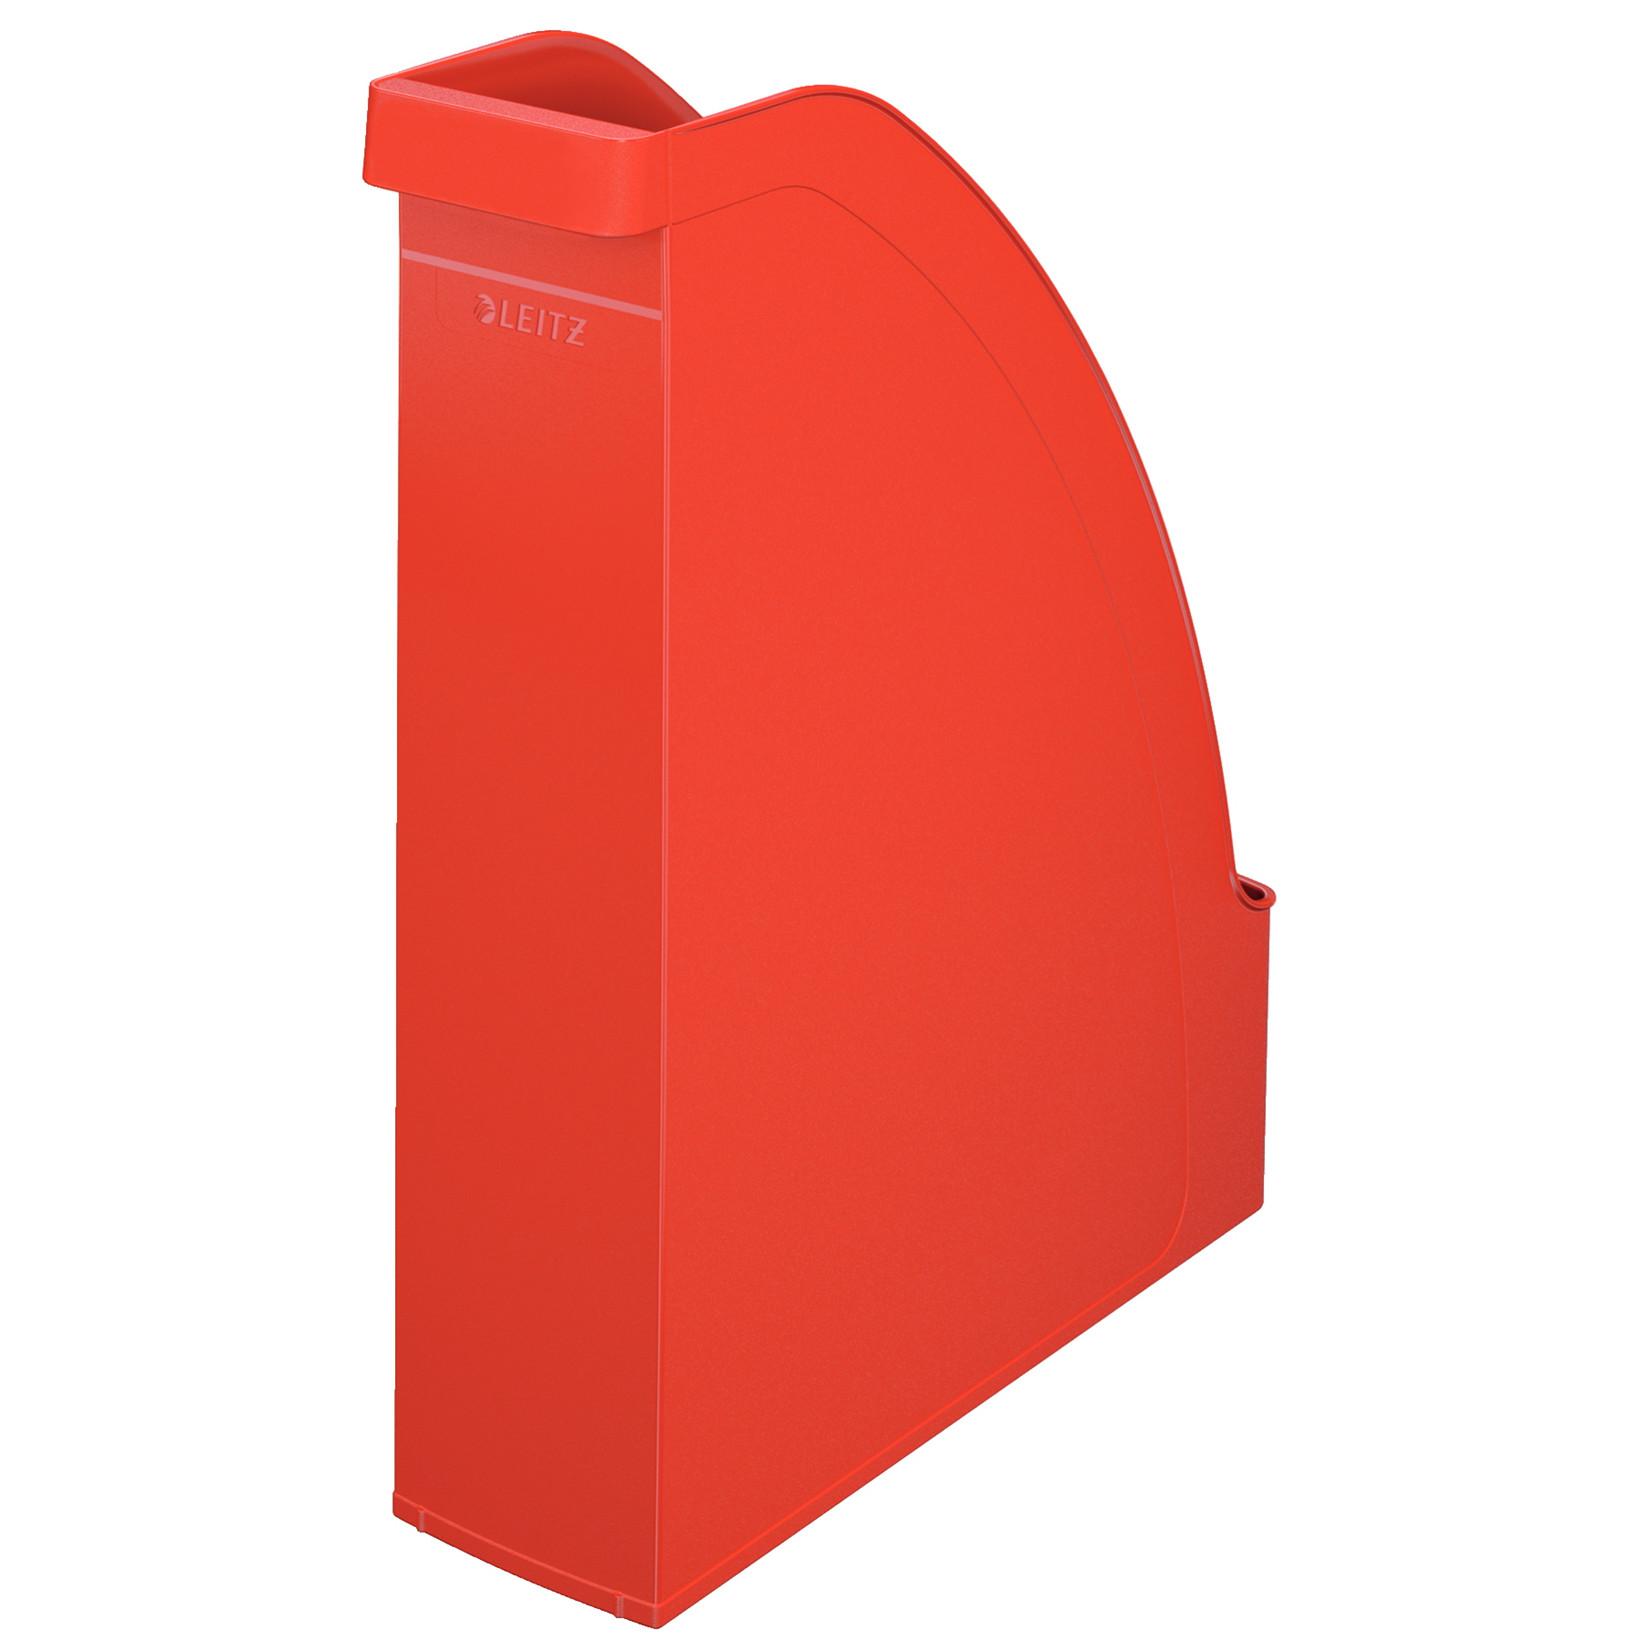 A4 Tidsskriftkassette Leitz Plus 70 mm ryg | Rød